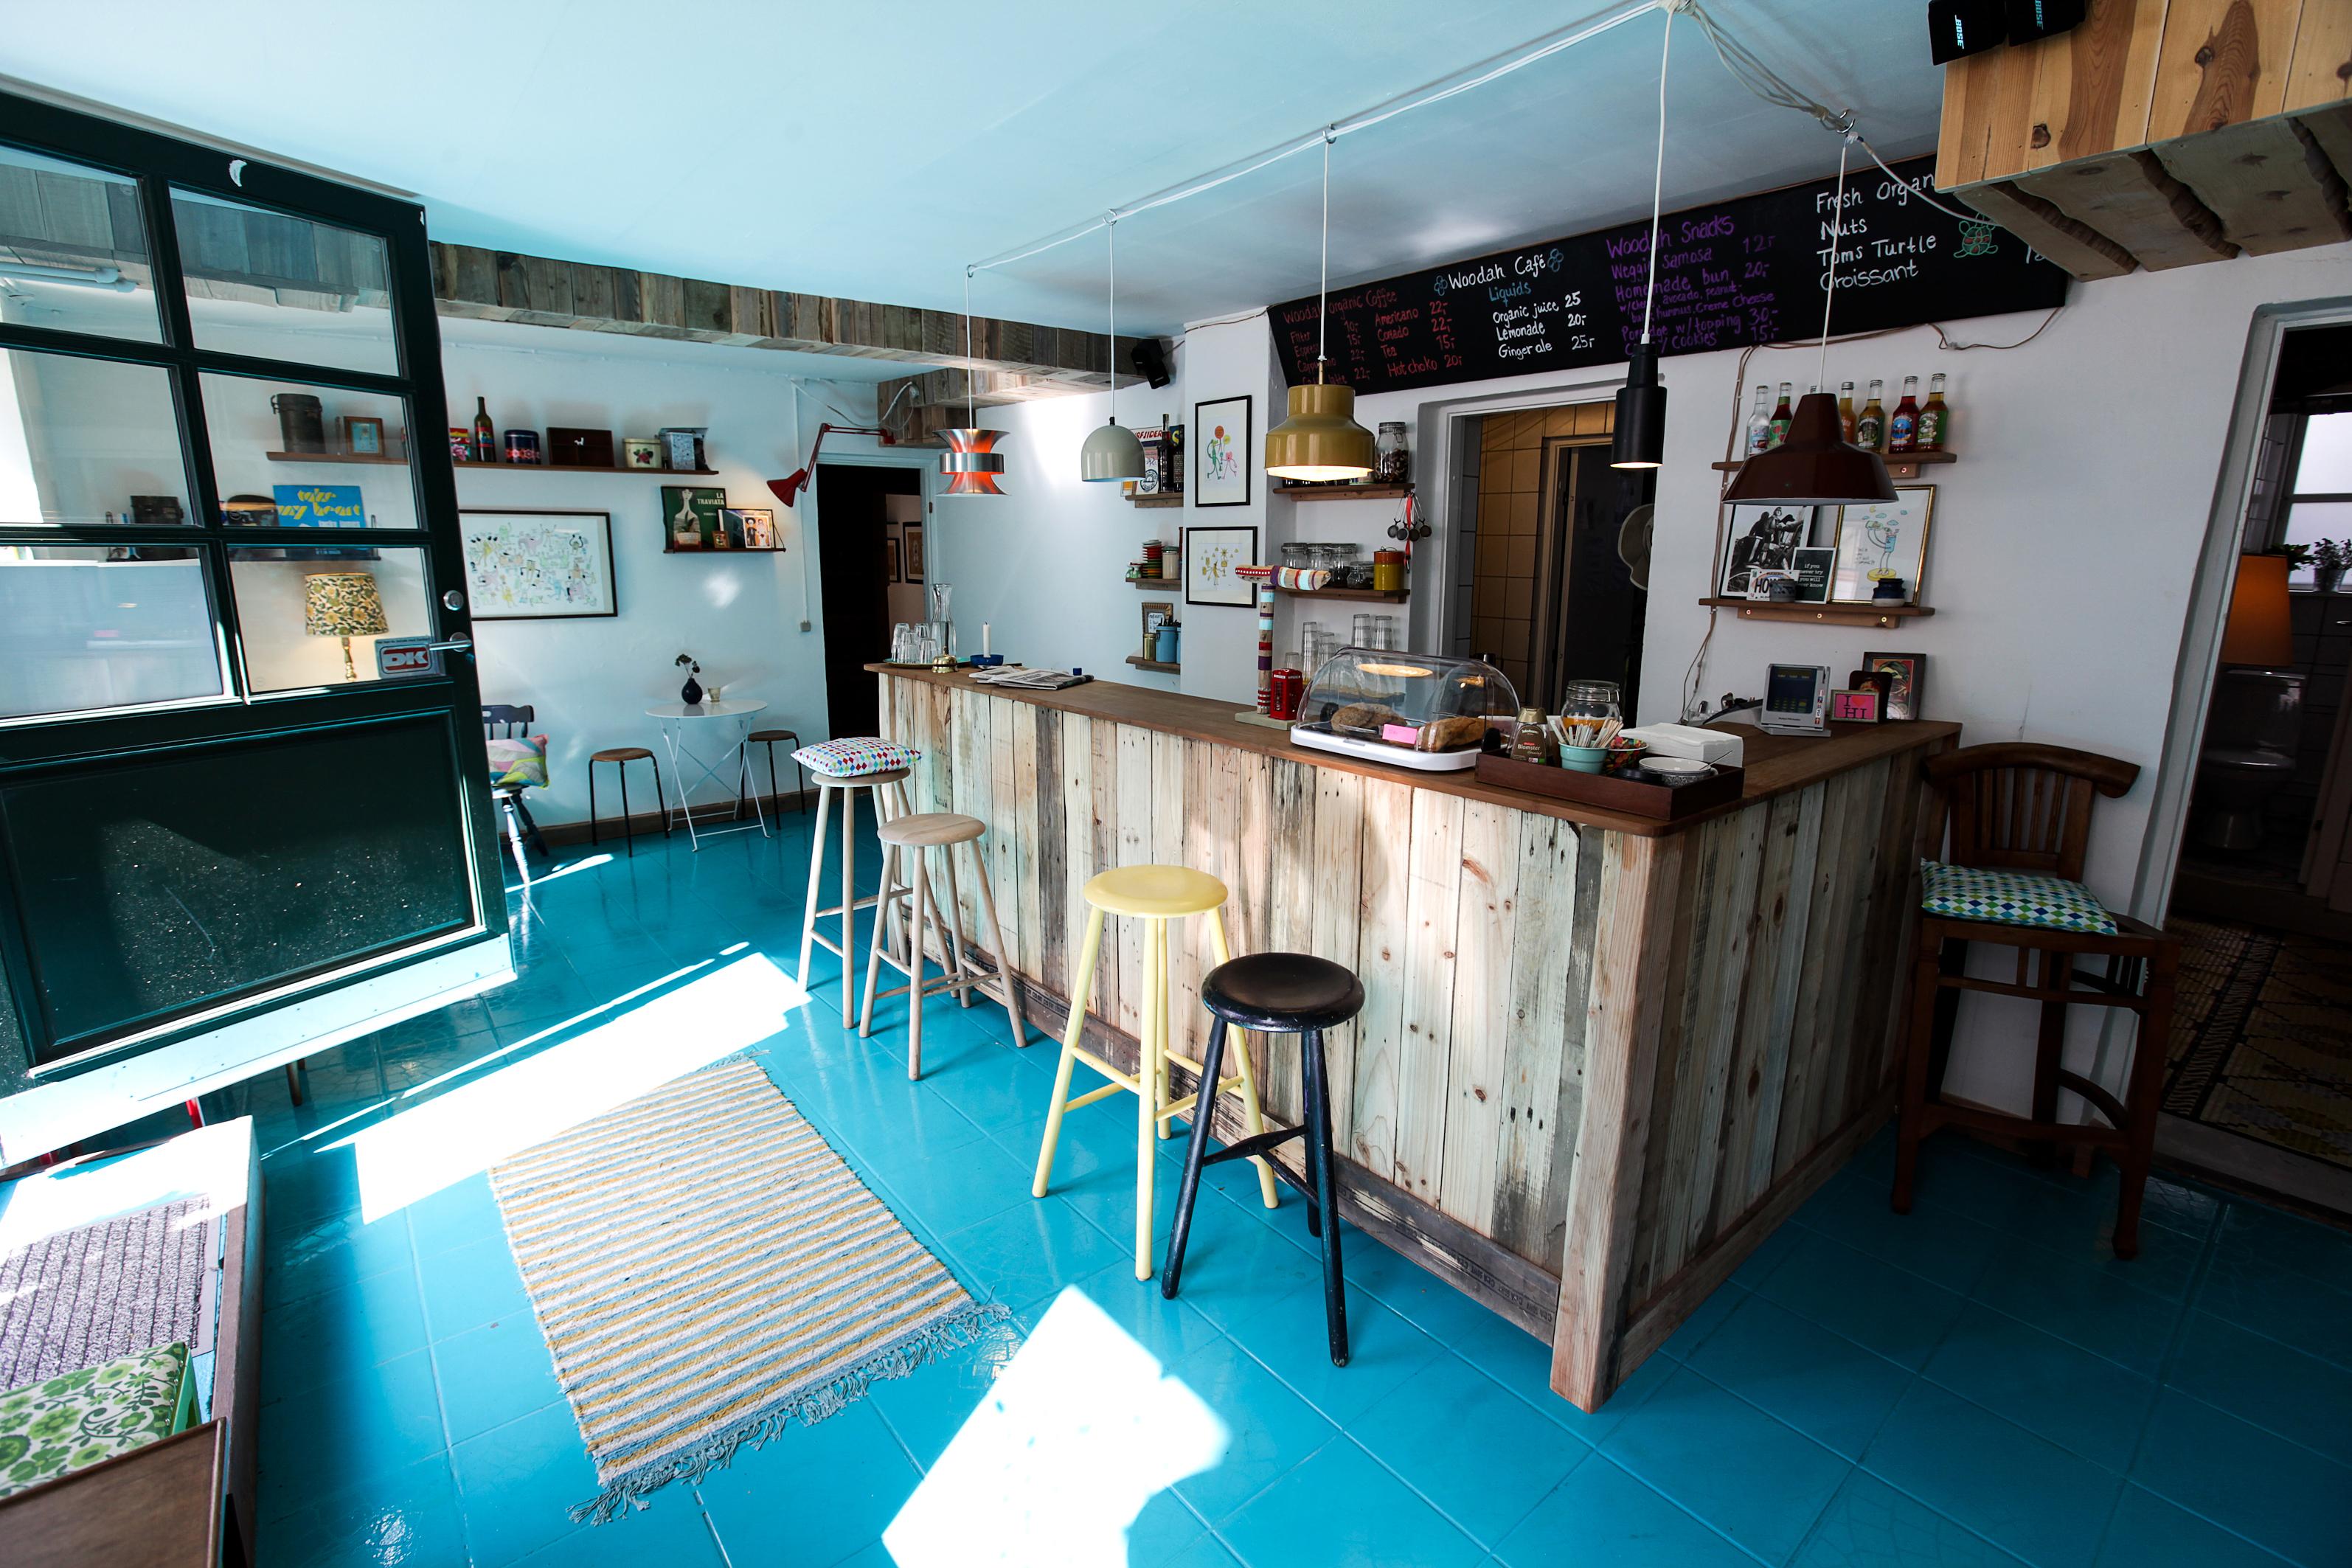 Woodah hostel copenhagen photos ryans air adventures for Kopenhagen hostel